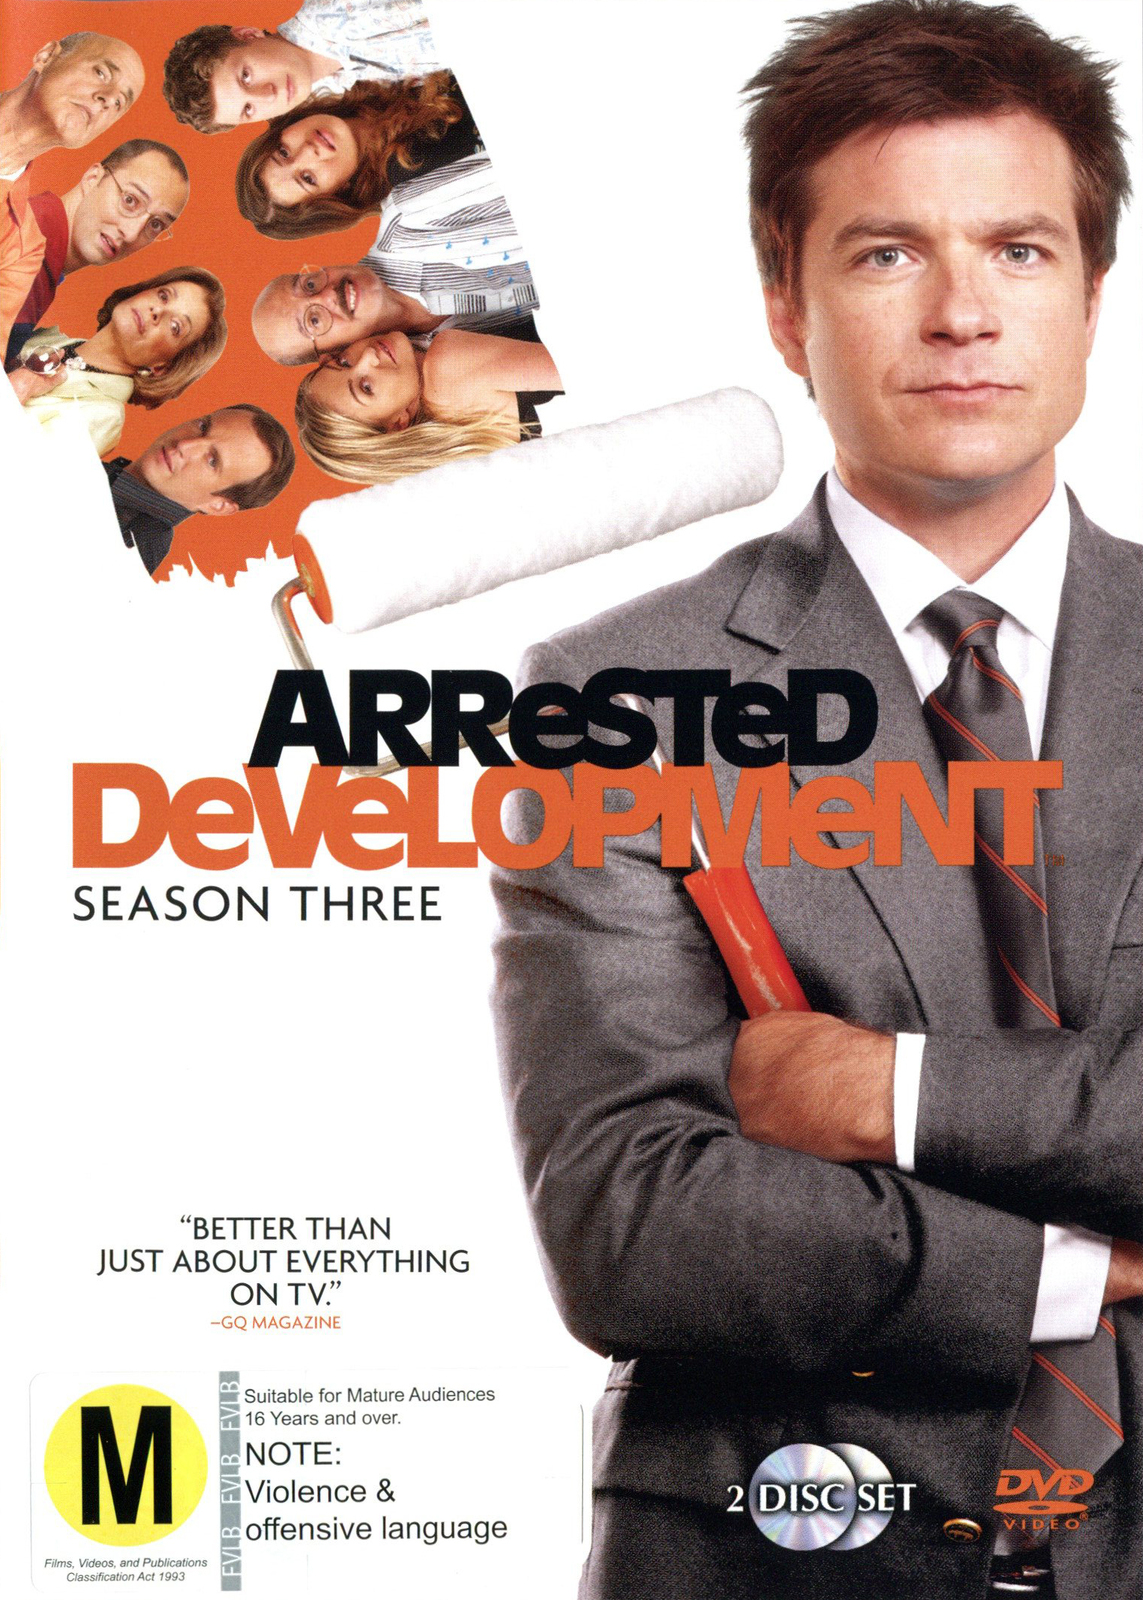 Arrested Development - Season 3 (3 Disc Set) on DVD image